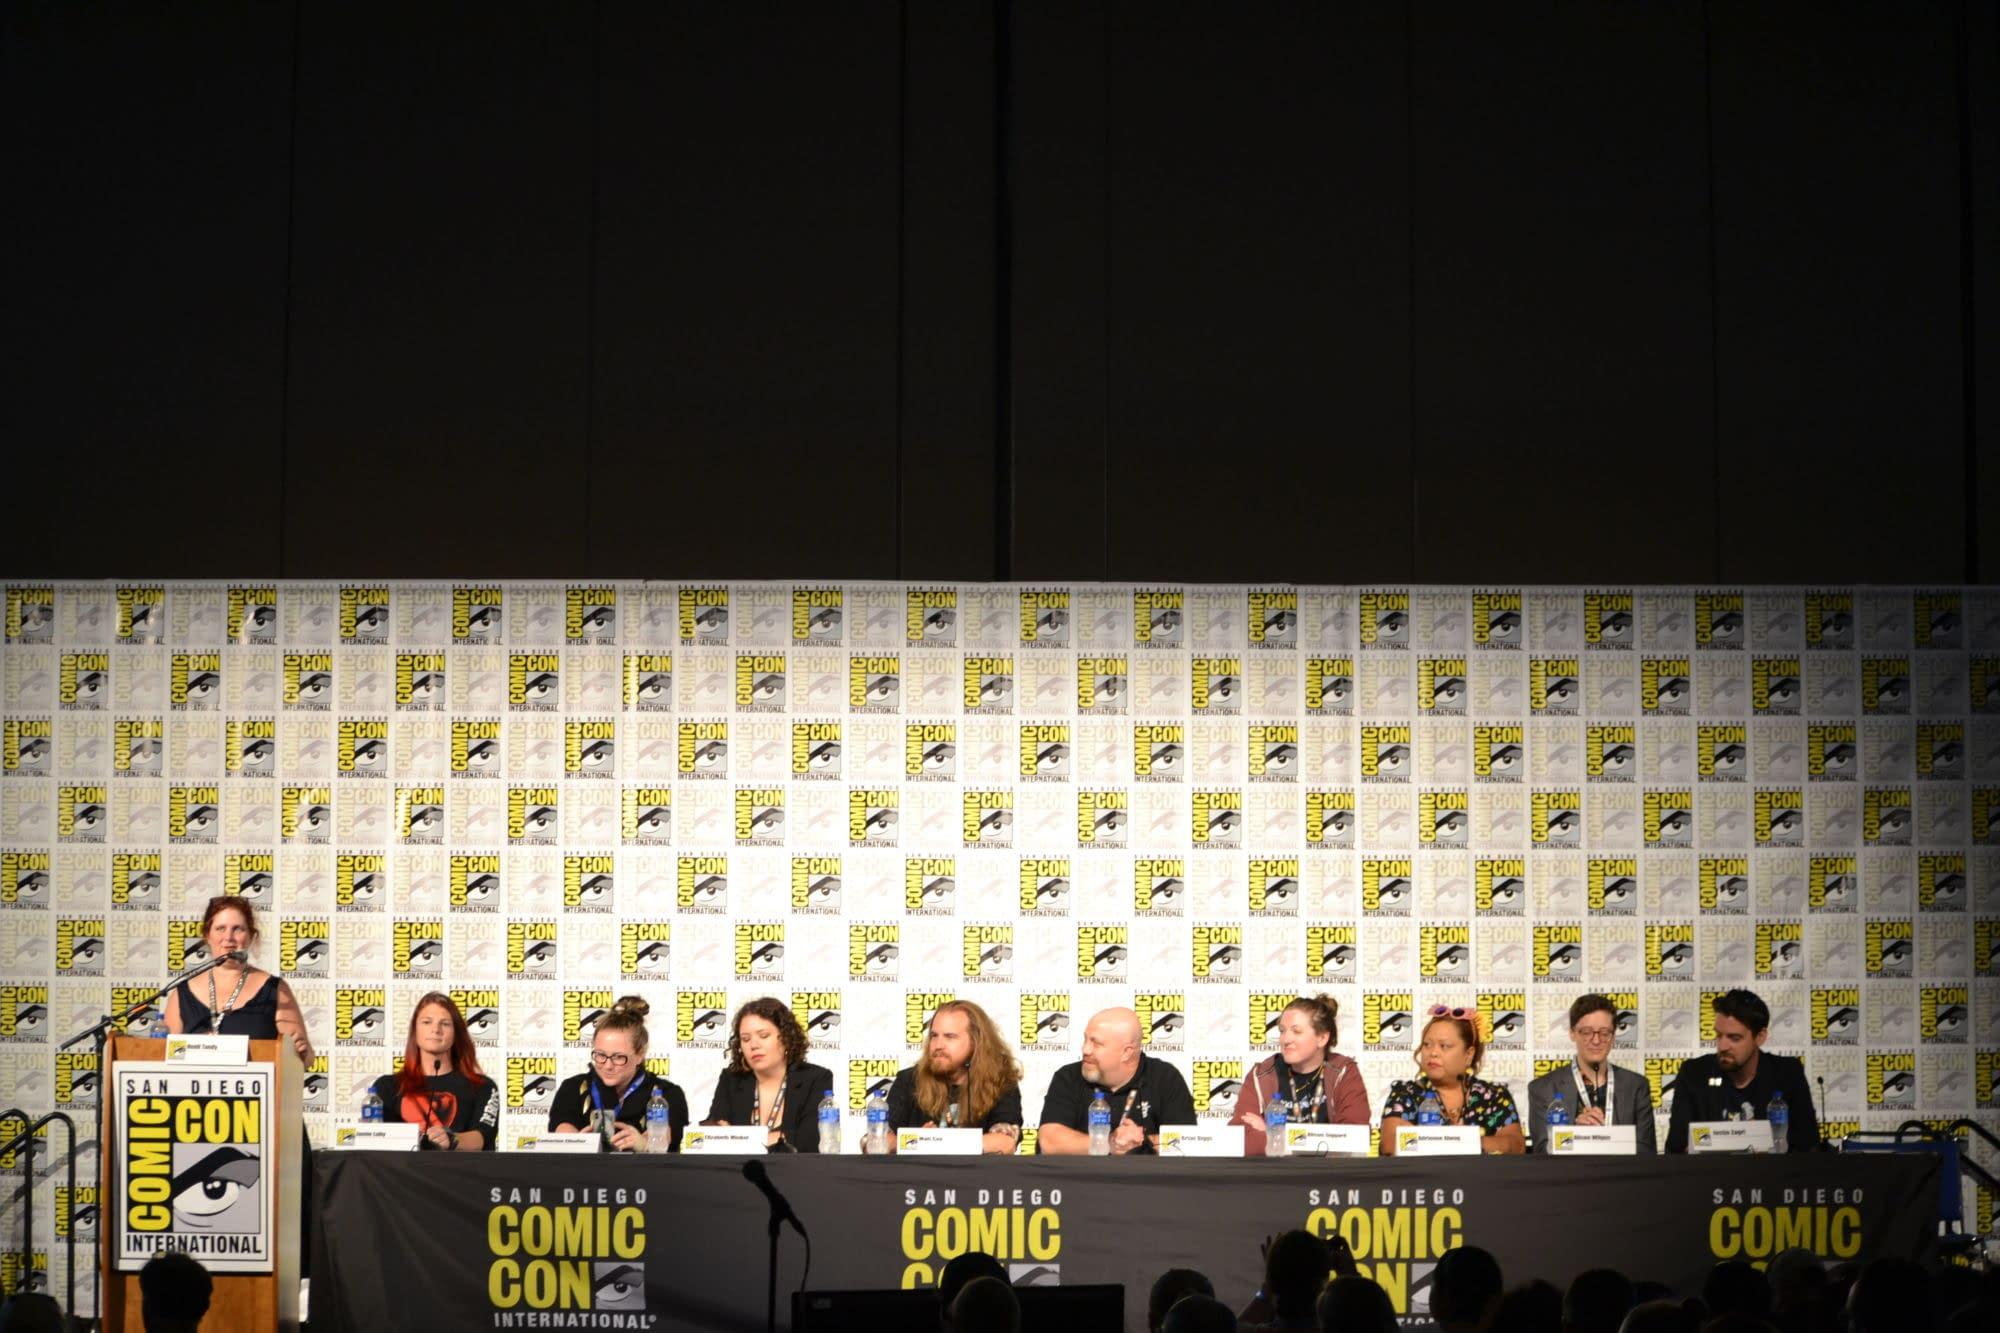 SDCC 2019 Harry Potter Fandom Panel - Has The Fandom Outgrown Their Canon?